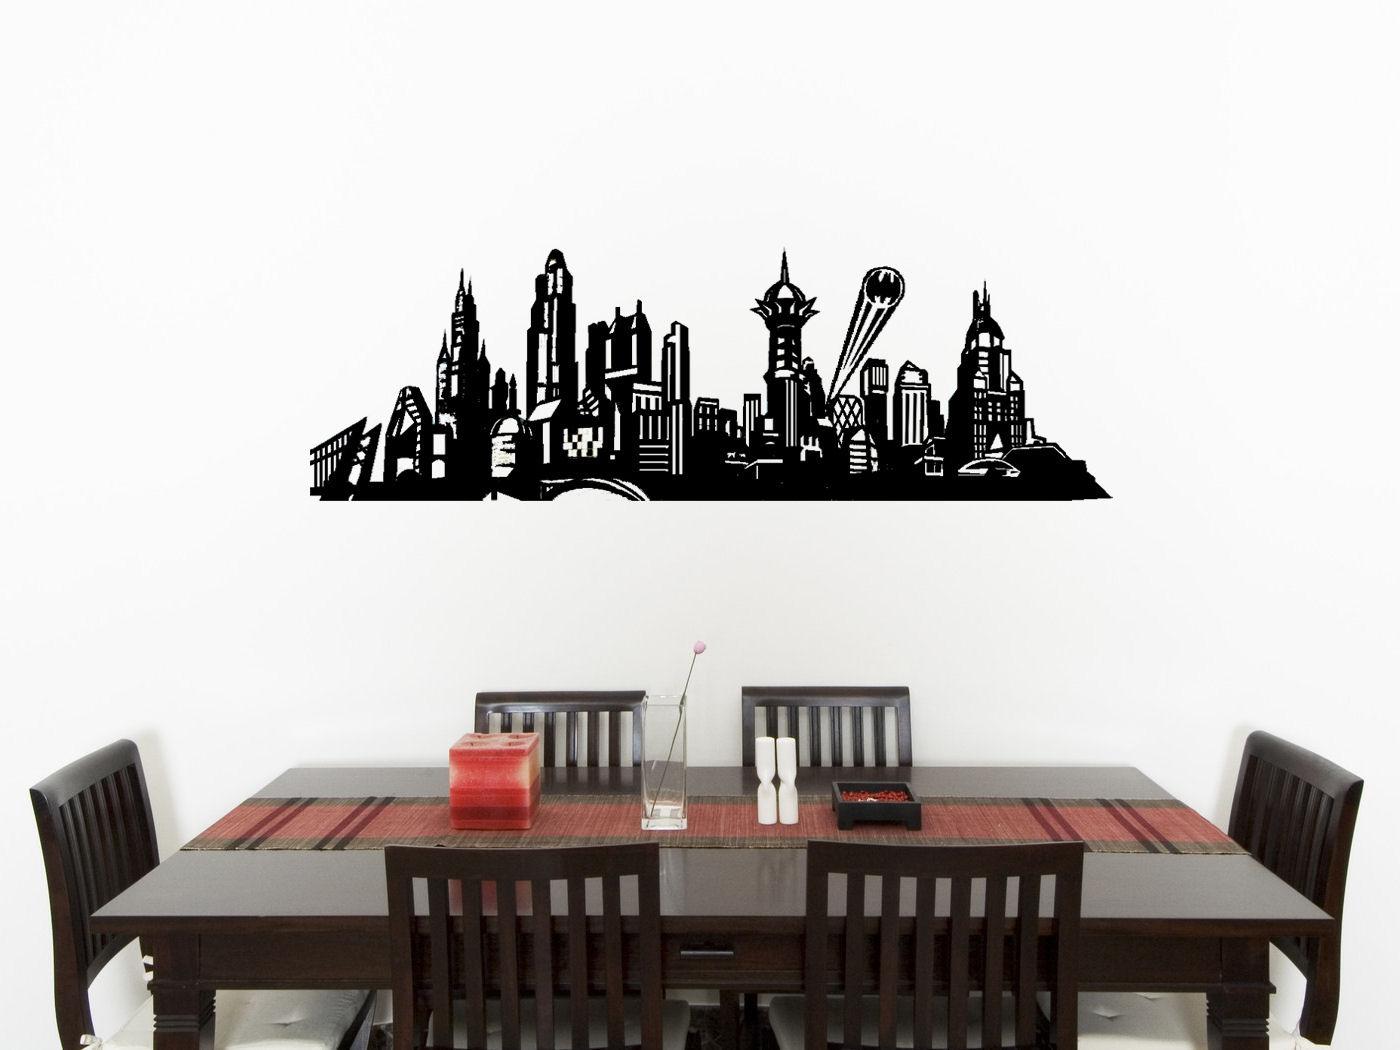 Gotham City Skyline Batman Children's Bedroom Decal Wall Sticker Picture Poster